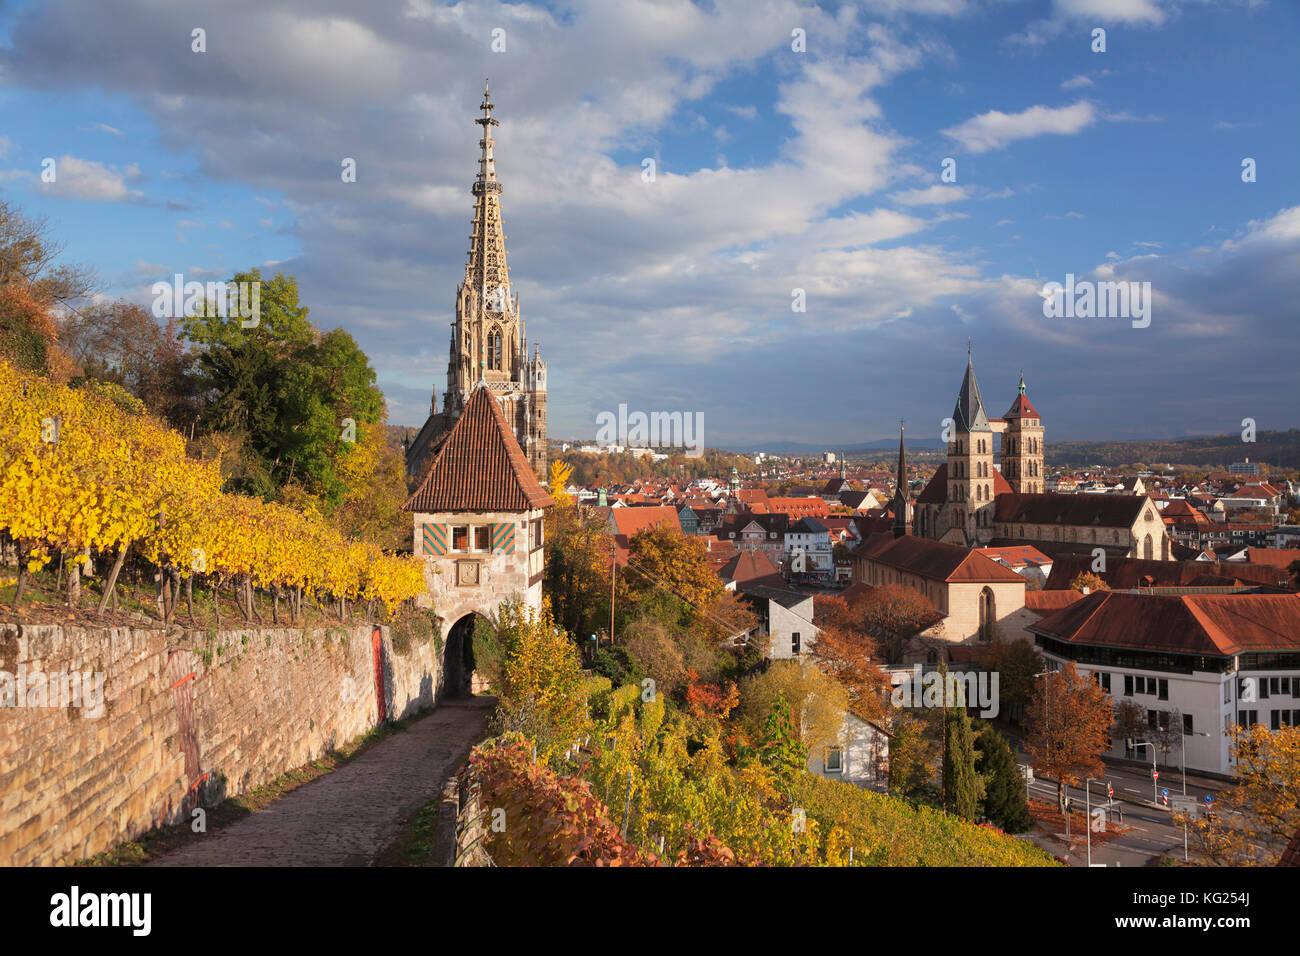 Vista da vigneti a Esslingen con st. dionys chiesa e chiesa Frauenkirche, Esslingen, BADEN-WURTTEMBERG, Germania, Immagini Stock